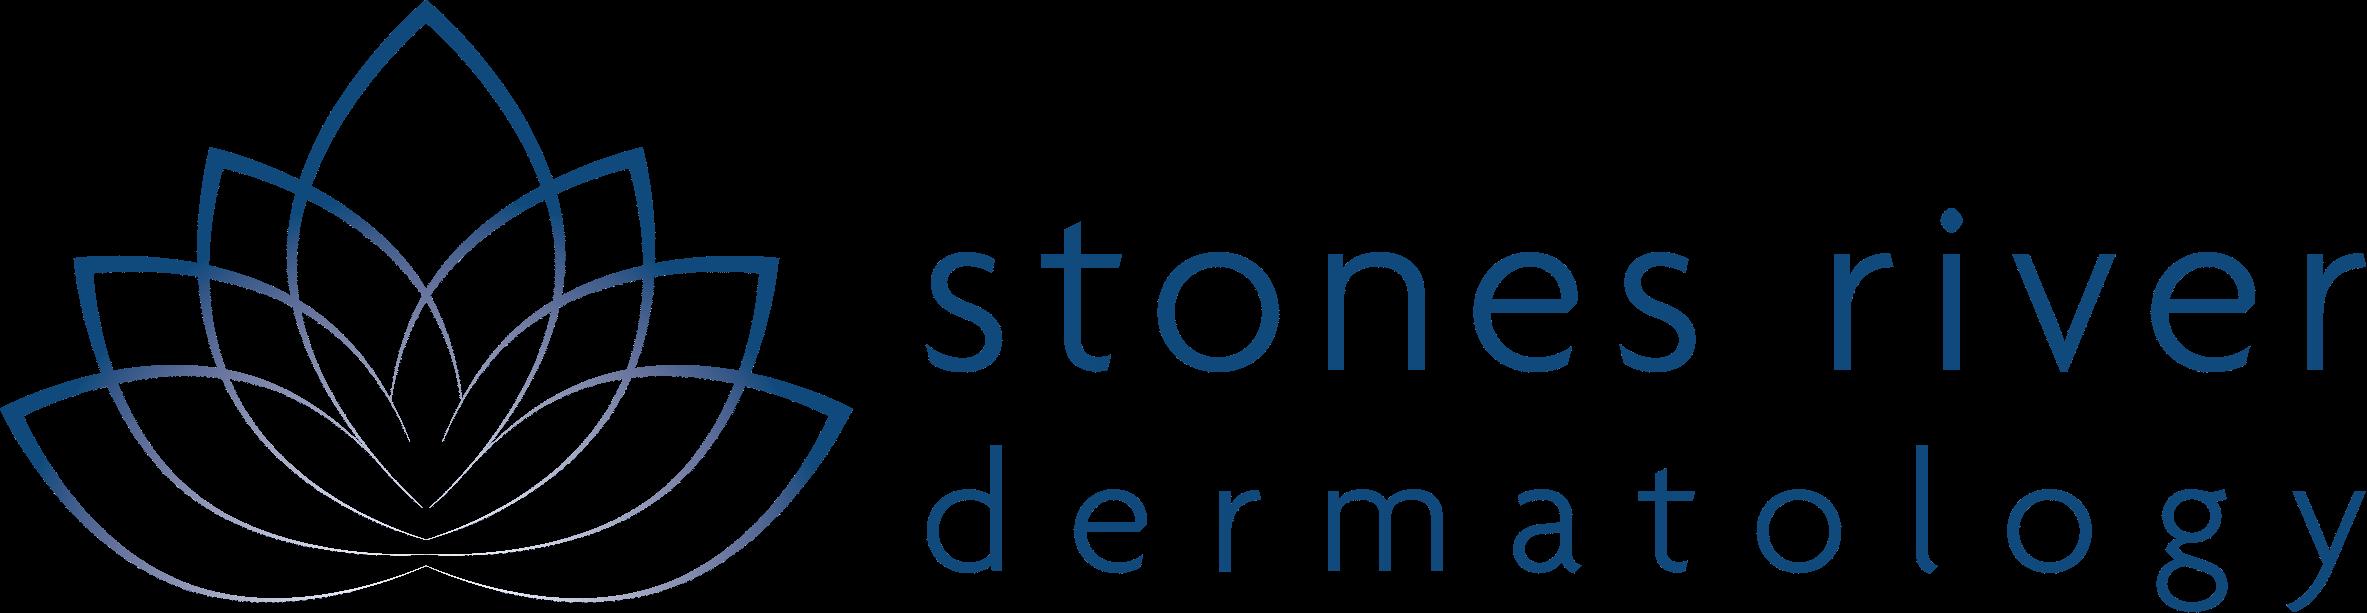 Dermatology, Dermatologist